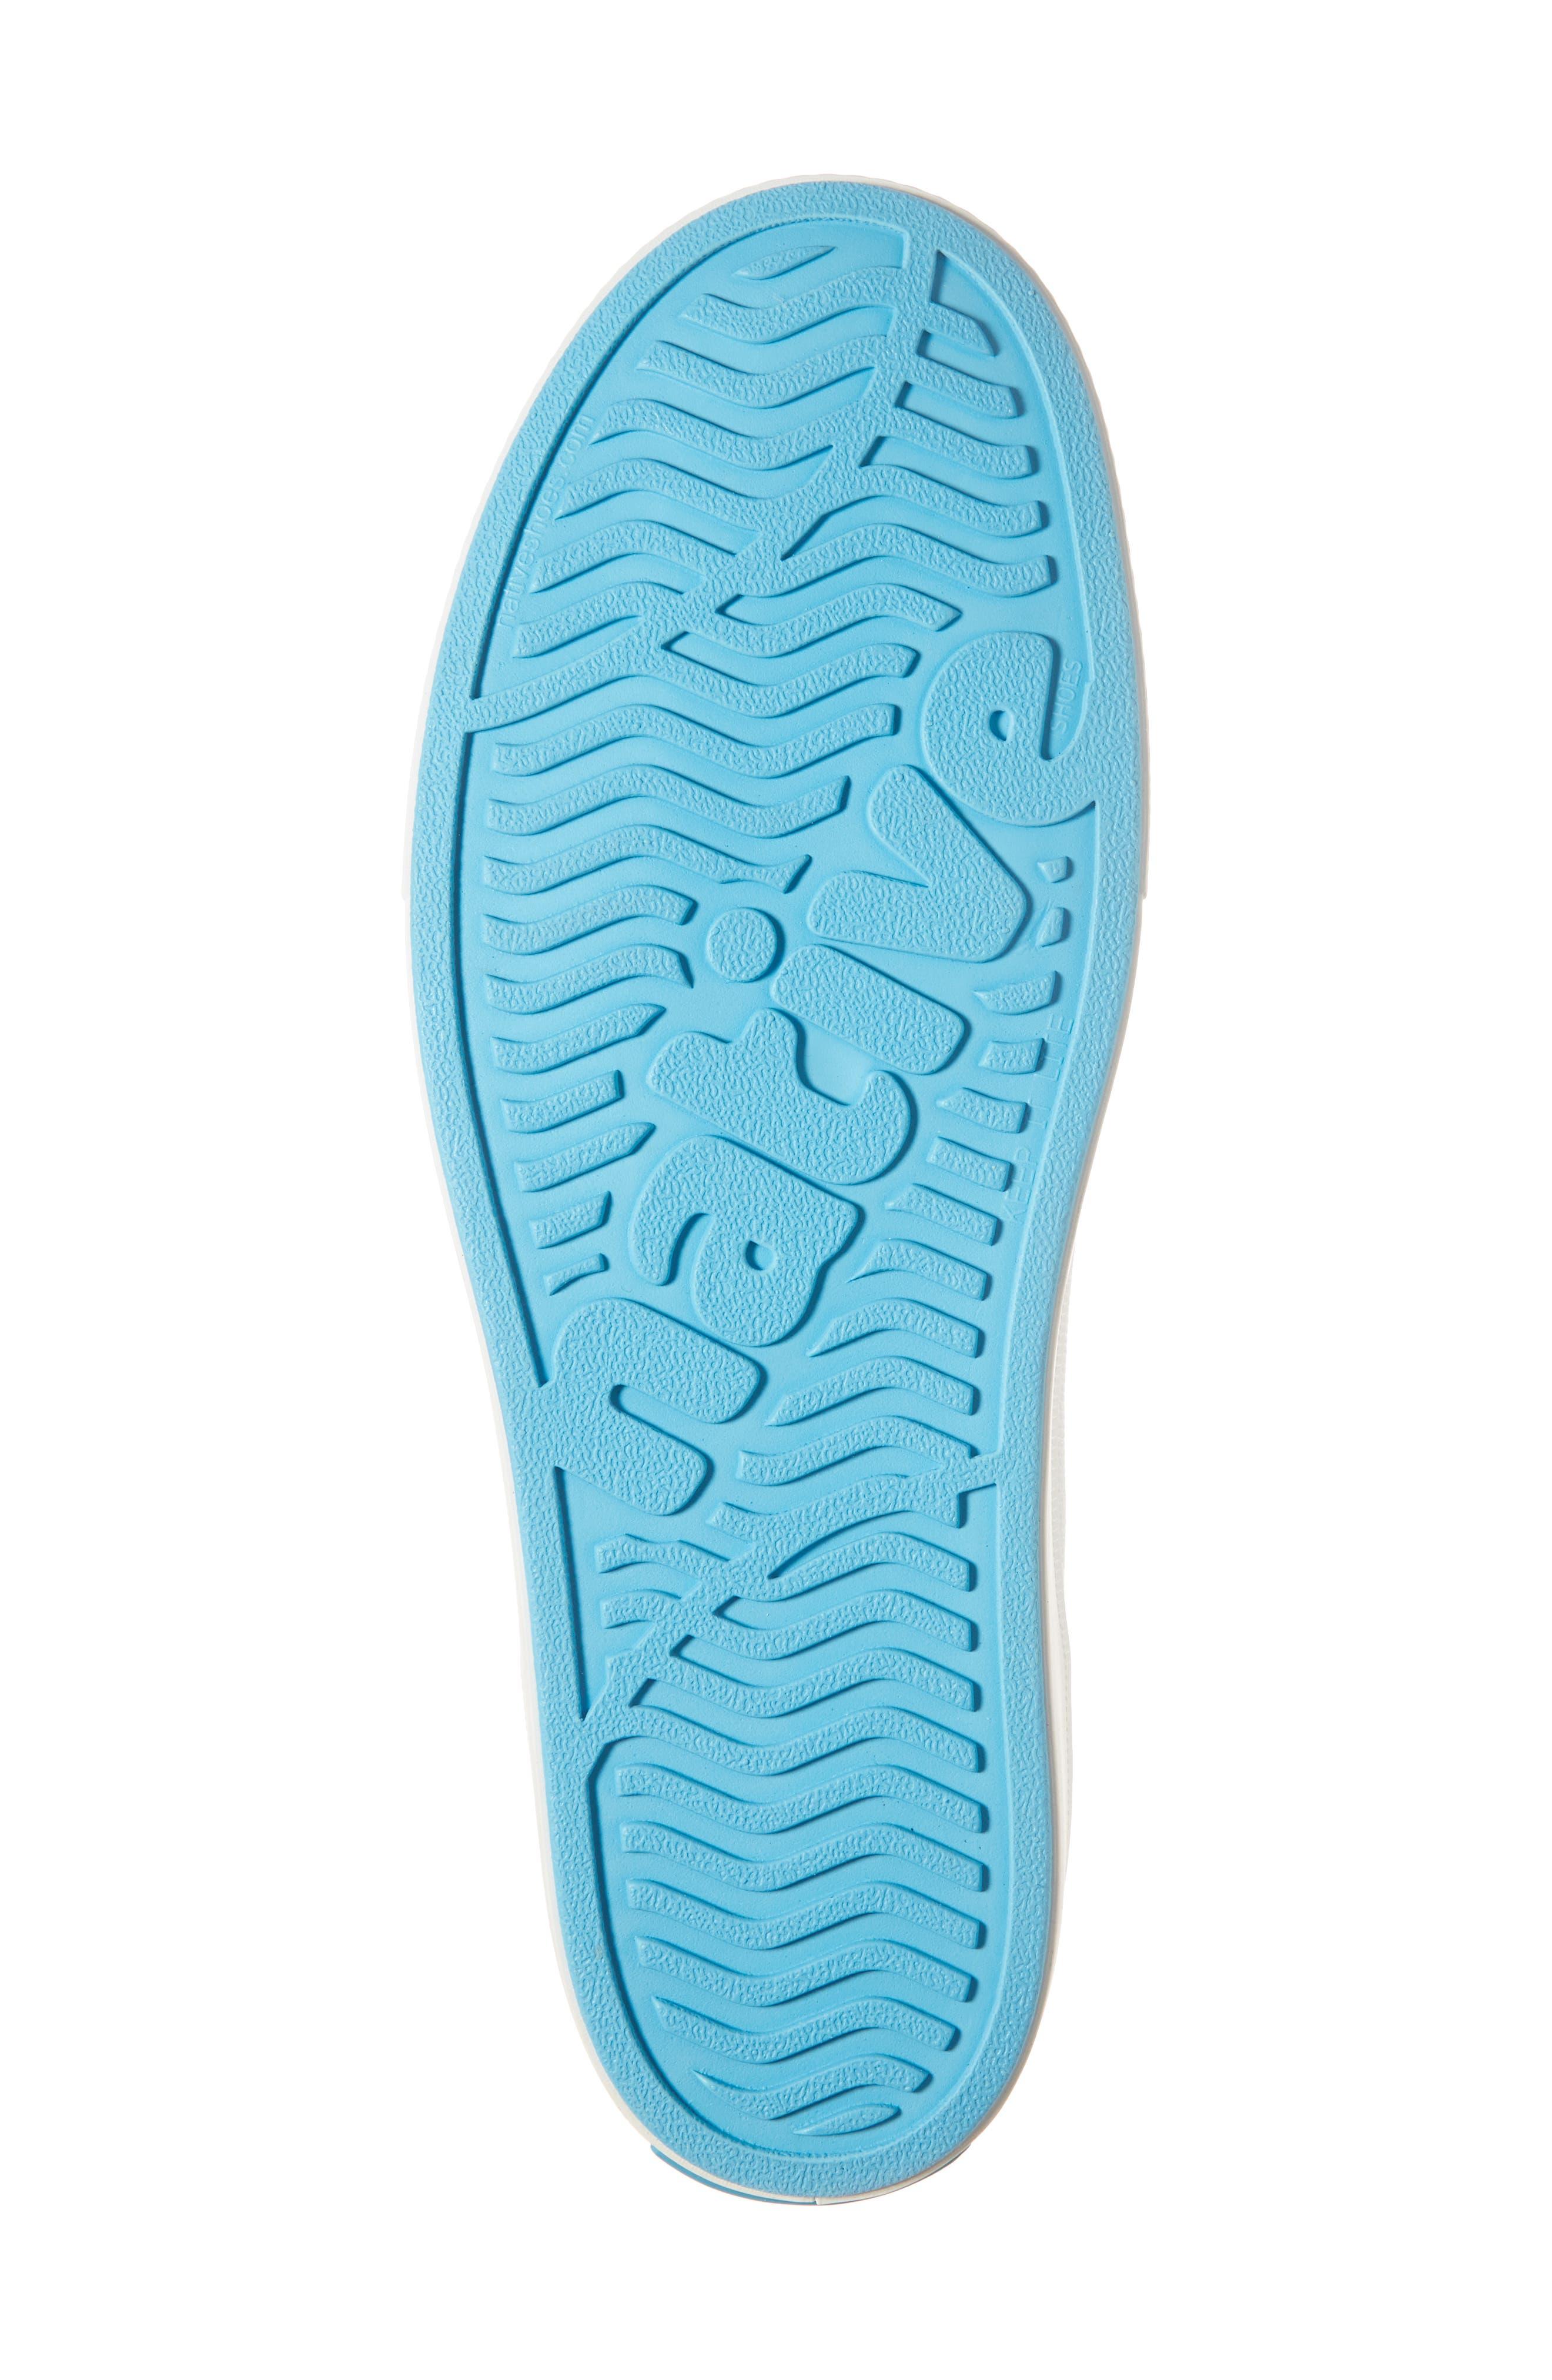 Native Miles LiteKnit Slip-On Sneaker,                             Alternate thumbnail 6, color,                             JIFFY BLACK/ SHELL WHITE